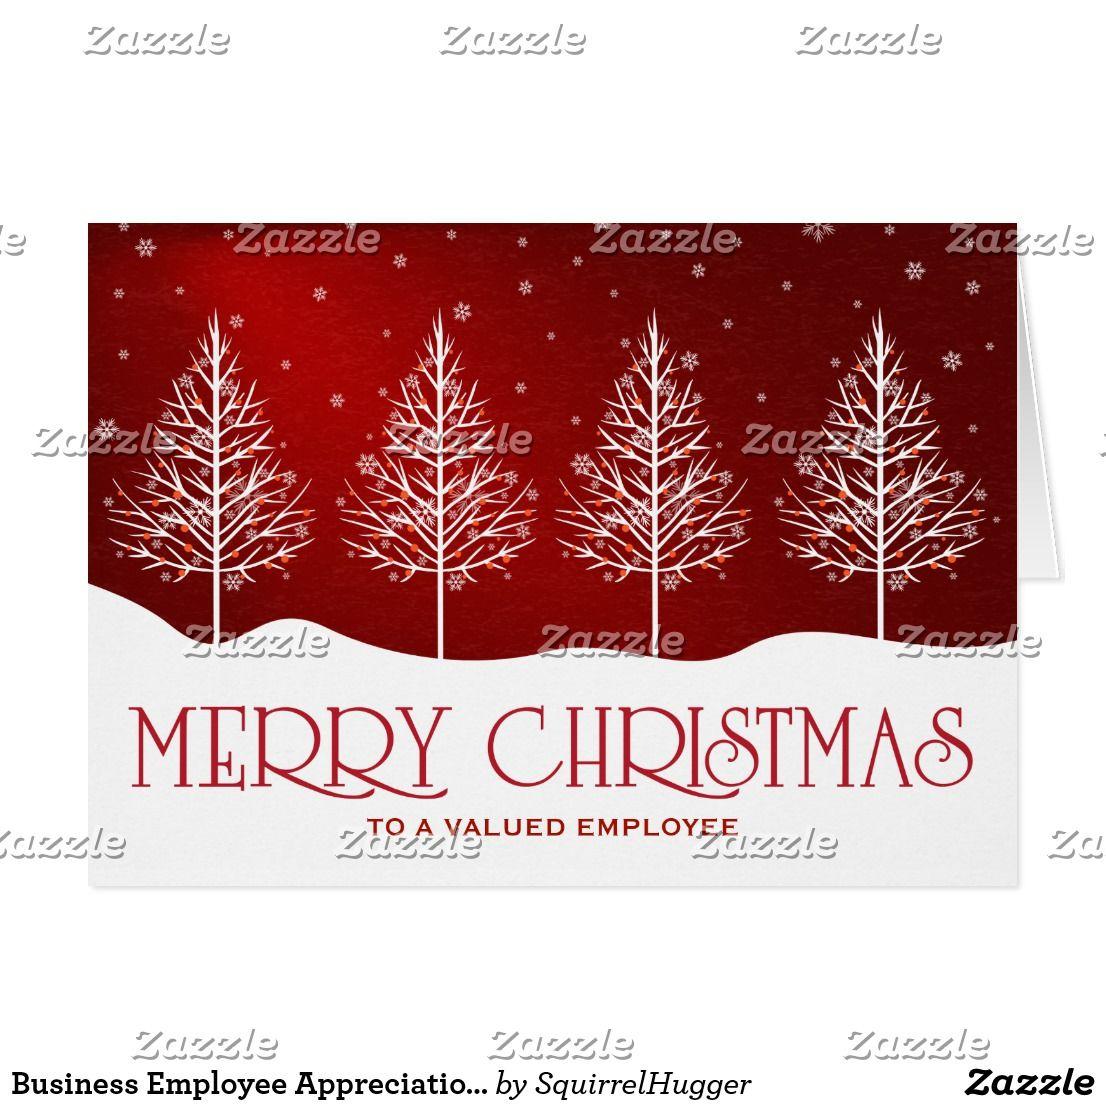 Business Employee Appreciation Christmas Greetings Holiday Card Zazzle Com Corporate Christmas Cards Business Holiday Cards Christmas Greetings